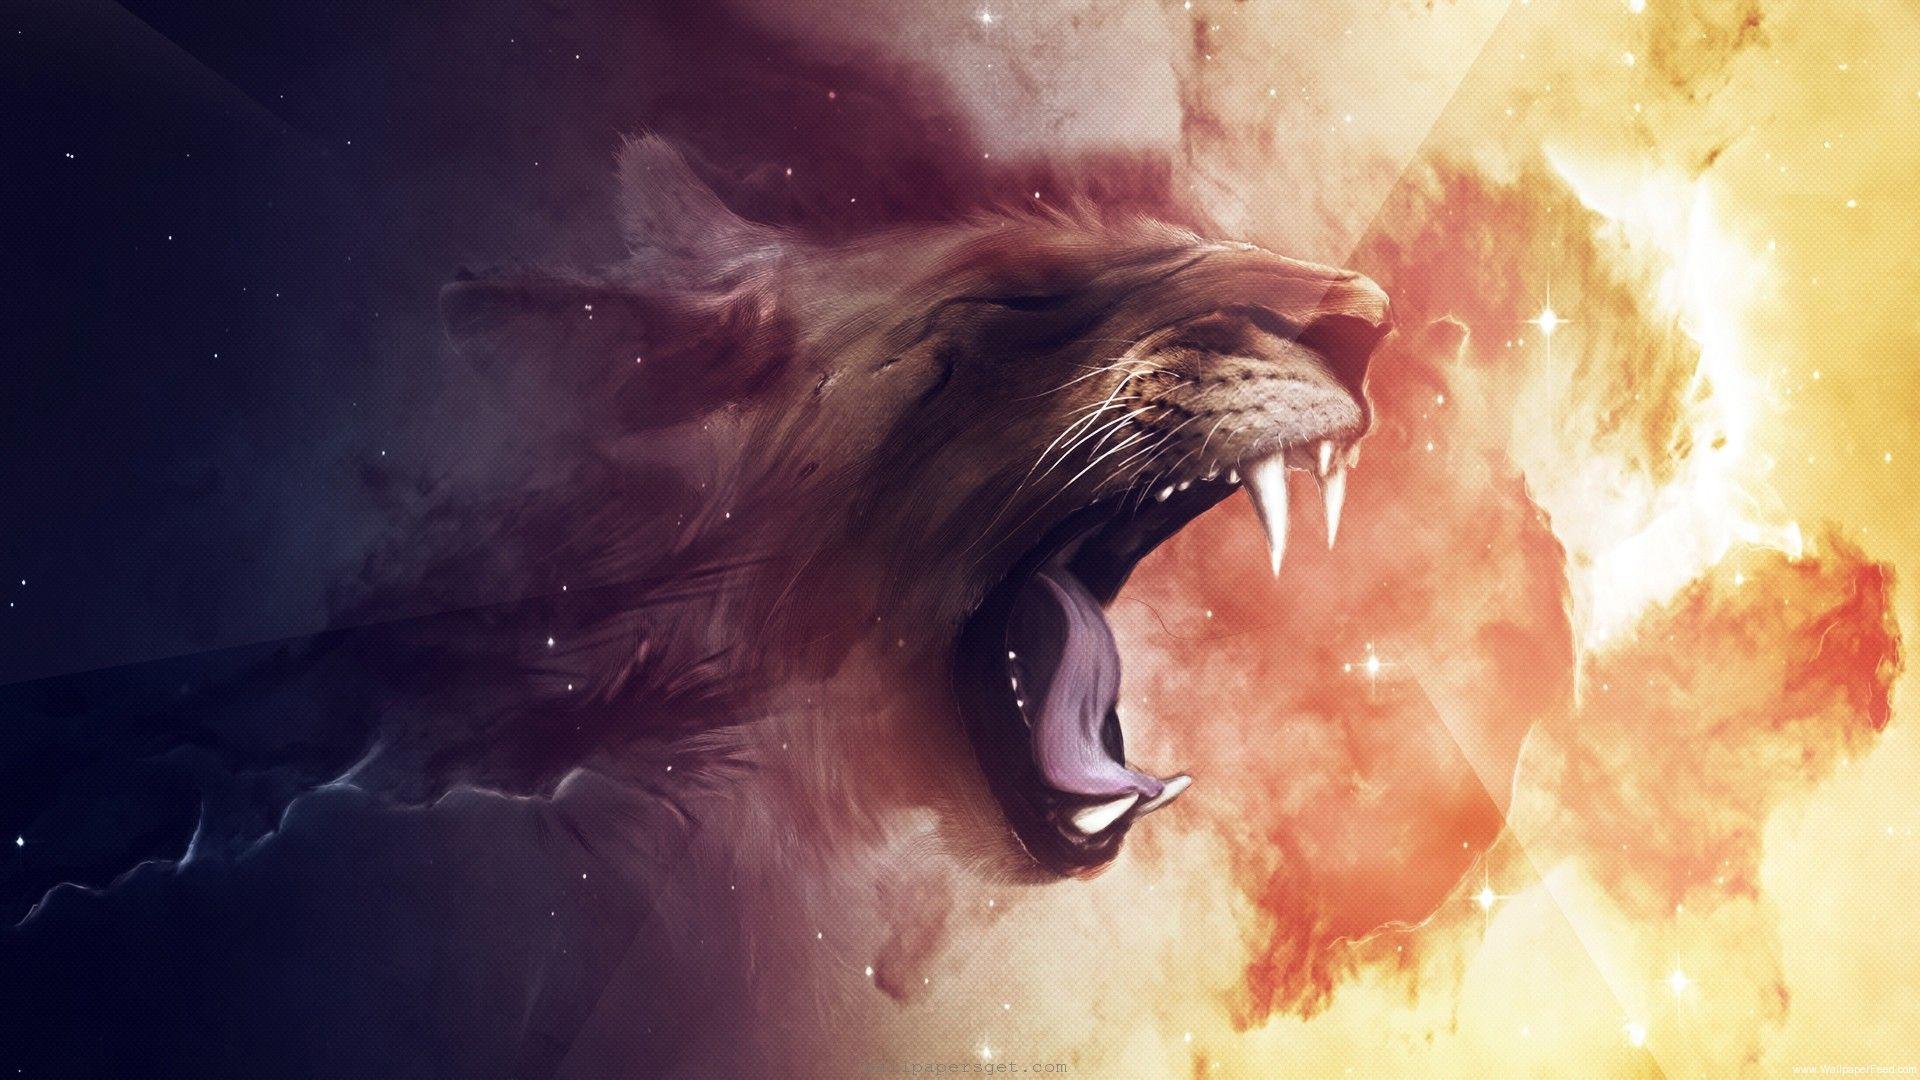 Free Wallpaper Lion Abstract Hd Lion Wallpaper Lion Art Lion